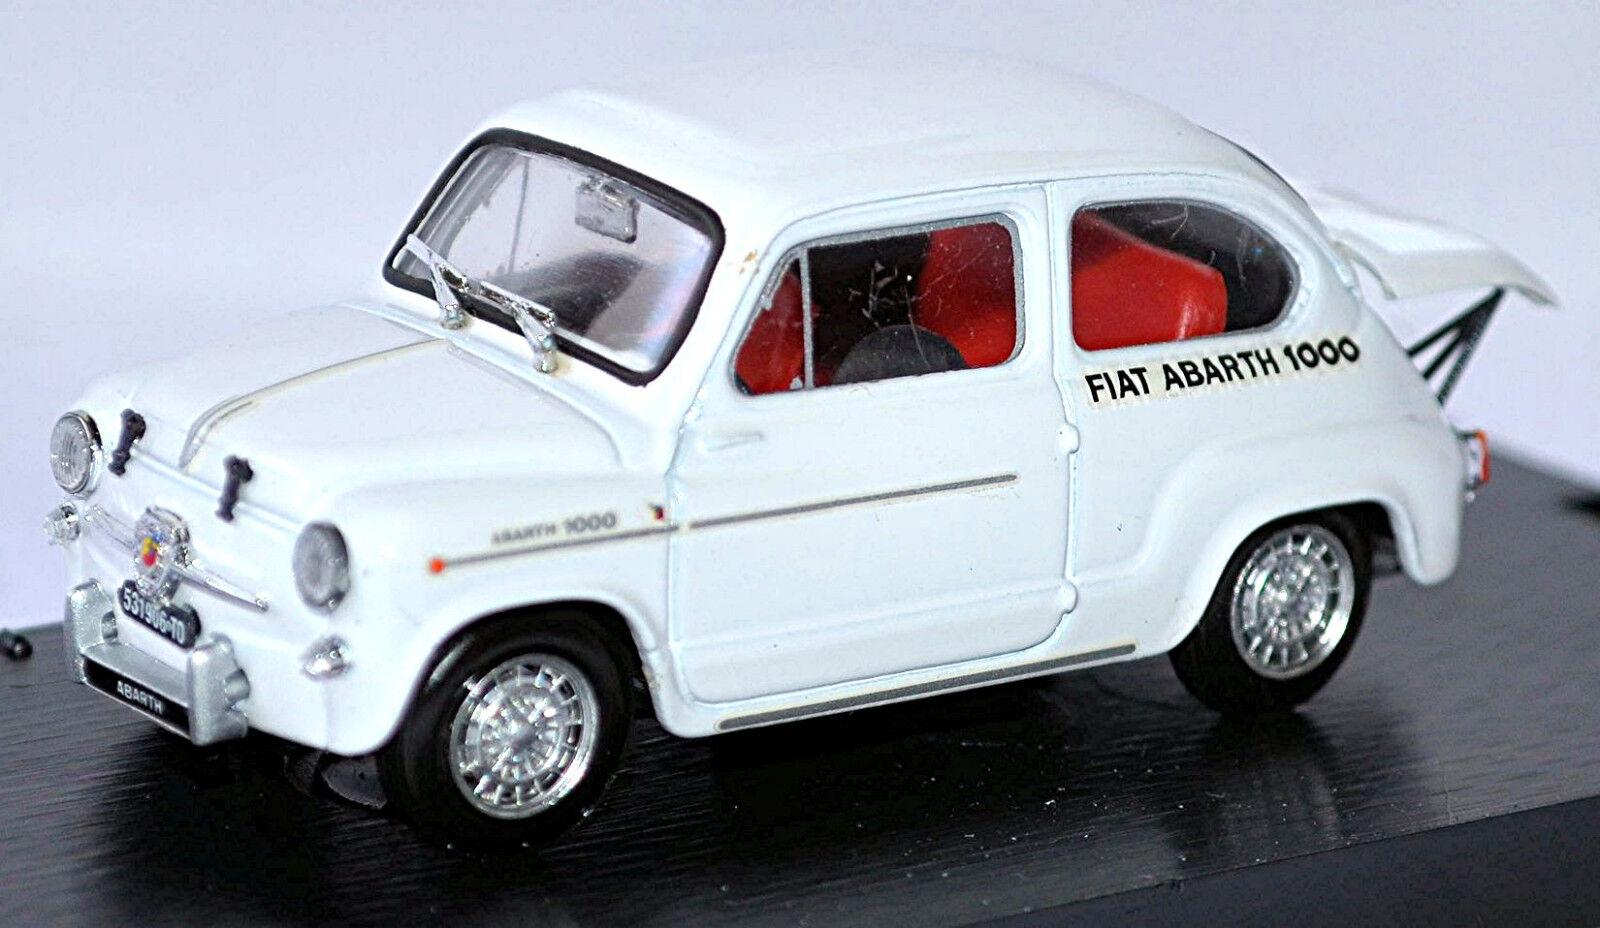 Fiat Abarth 1000 Berlina Radiatore MonteCochelo 1963 blancoo blancoo 1 43 Brumm